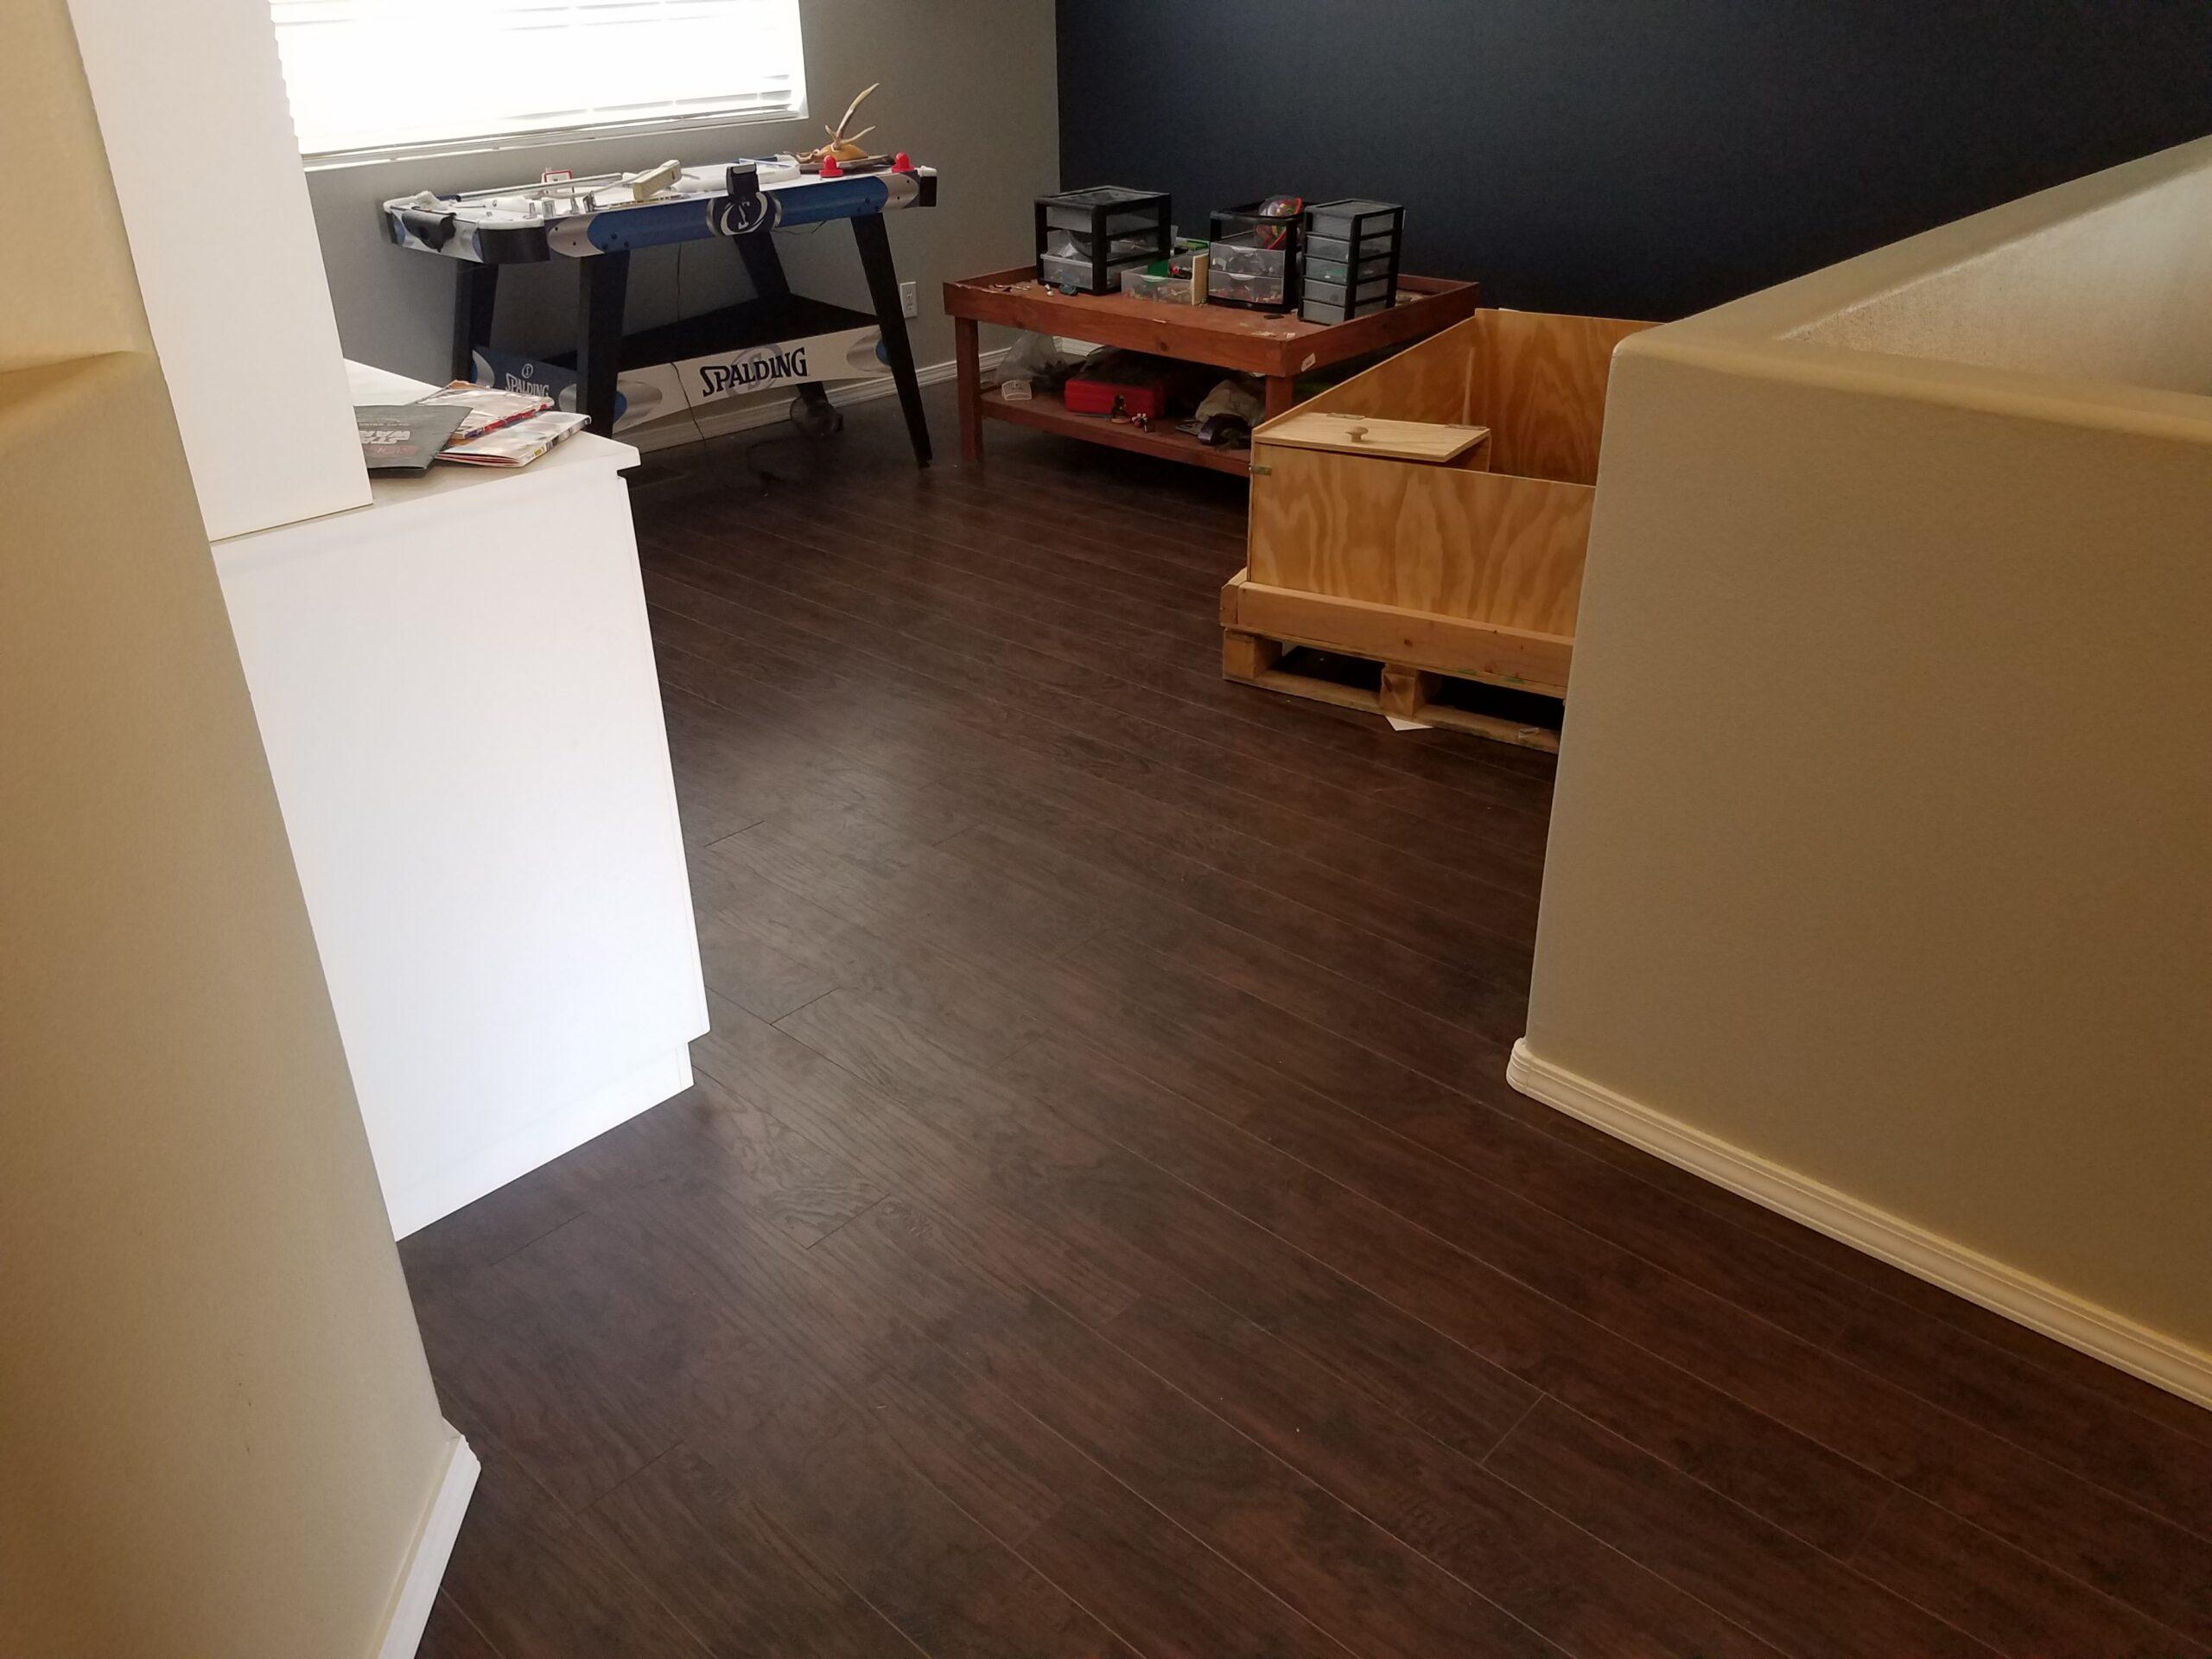 image showing flooring